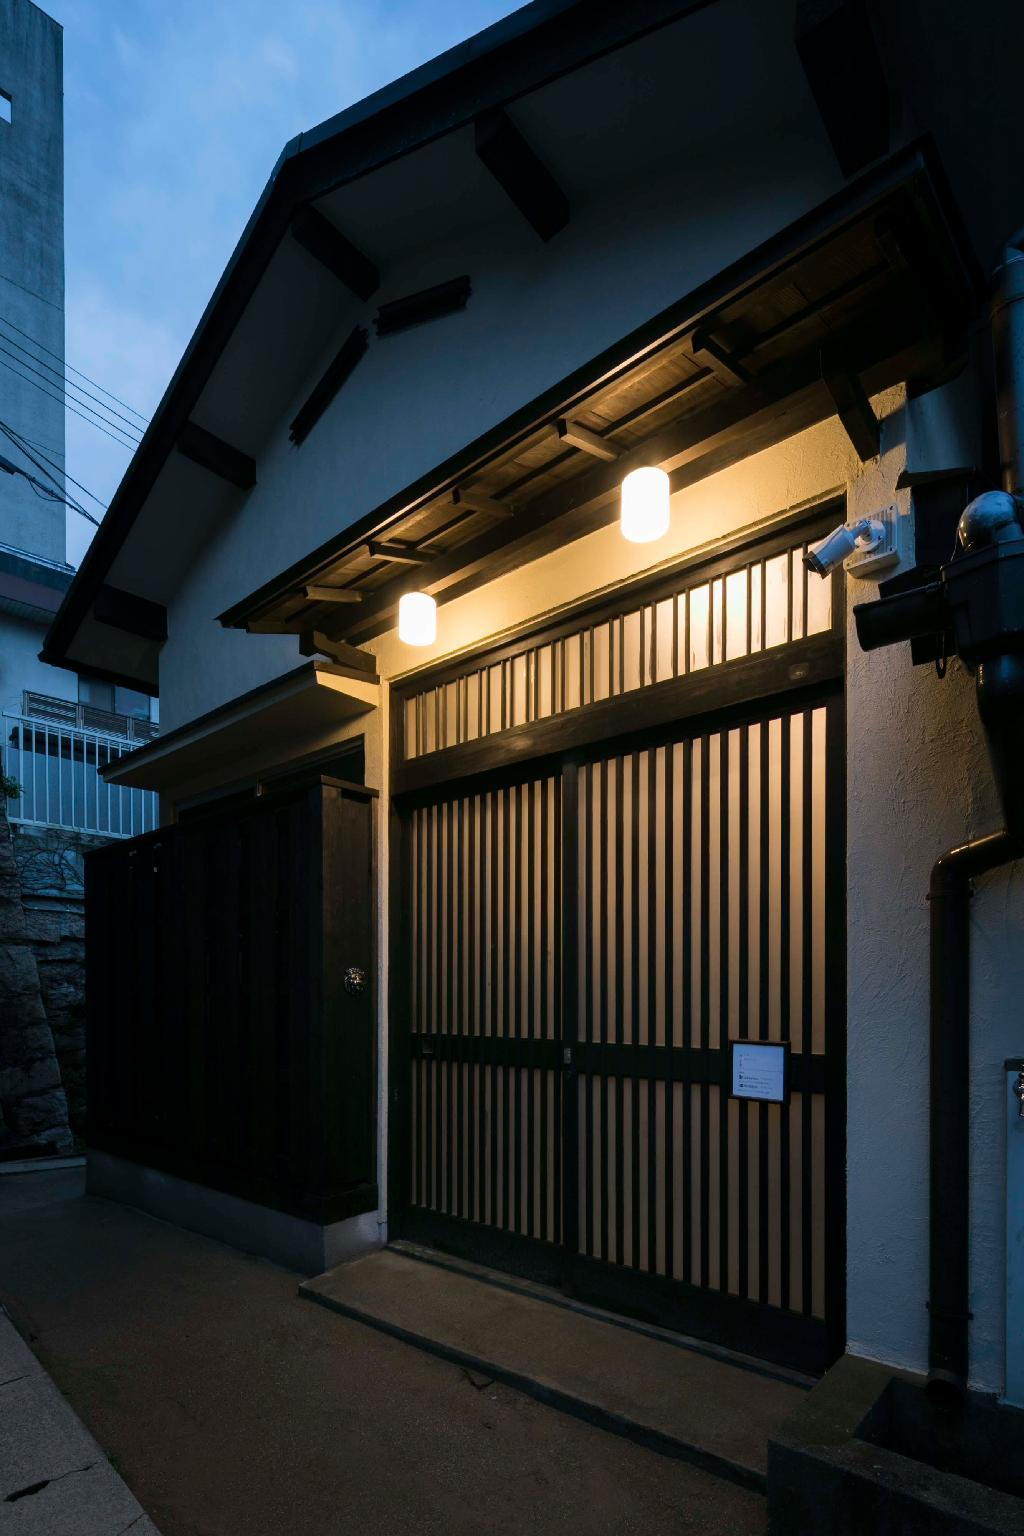 Koyado Uraku, Nishinomiya